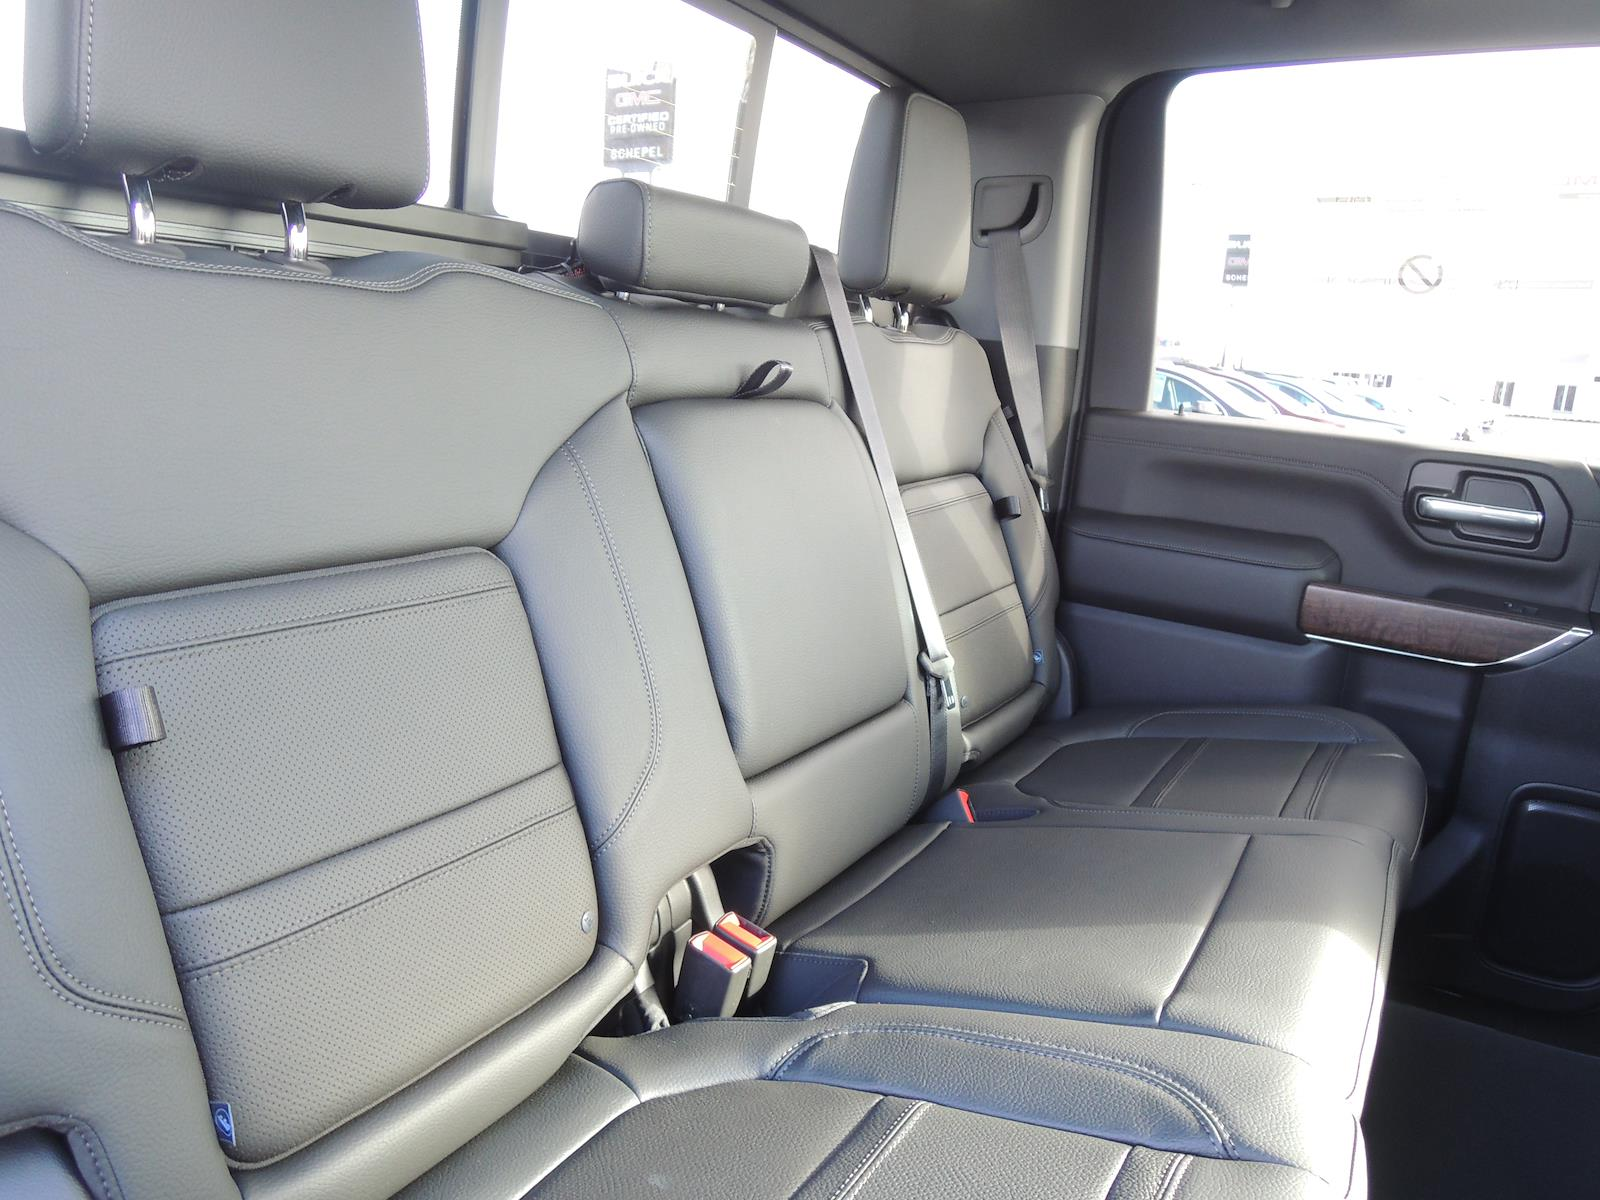 2021 GMC Sierra 2500 Crew Cab 4x4, Pickup #MT488 - photo 13